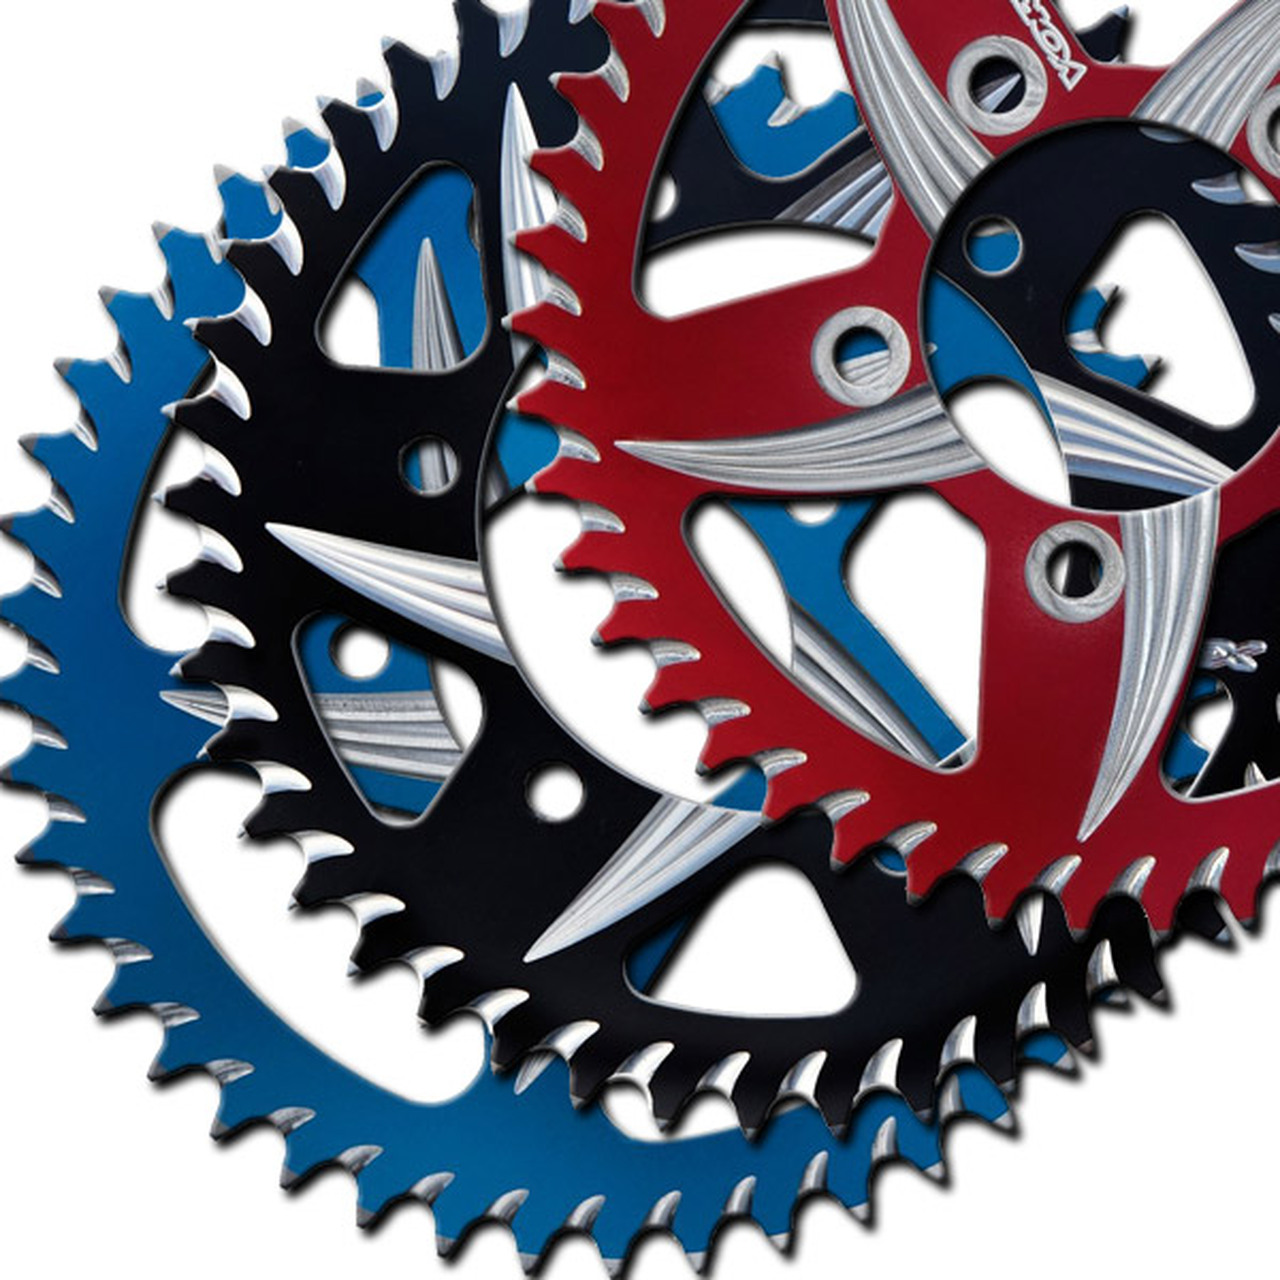 Black Shift Pattern 54n American Shifter 100337 Red Shift Knob with M16 x 1.5 Insert